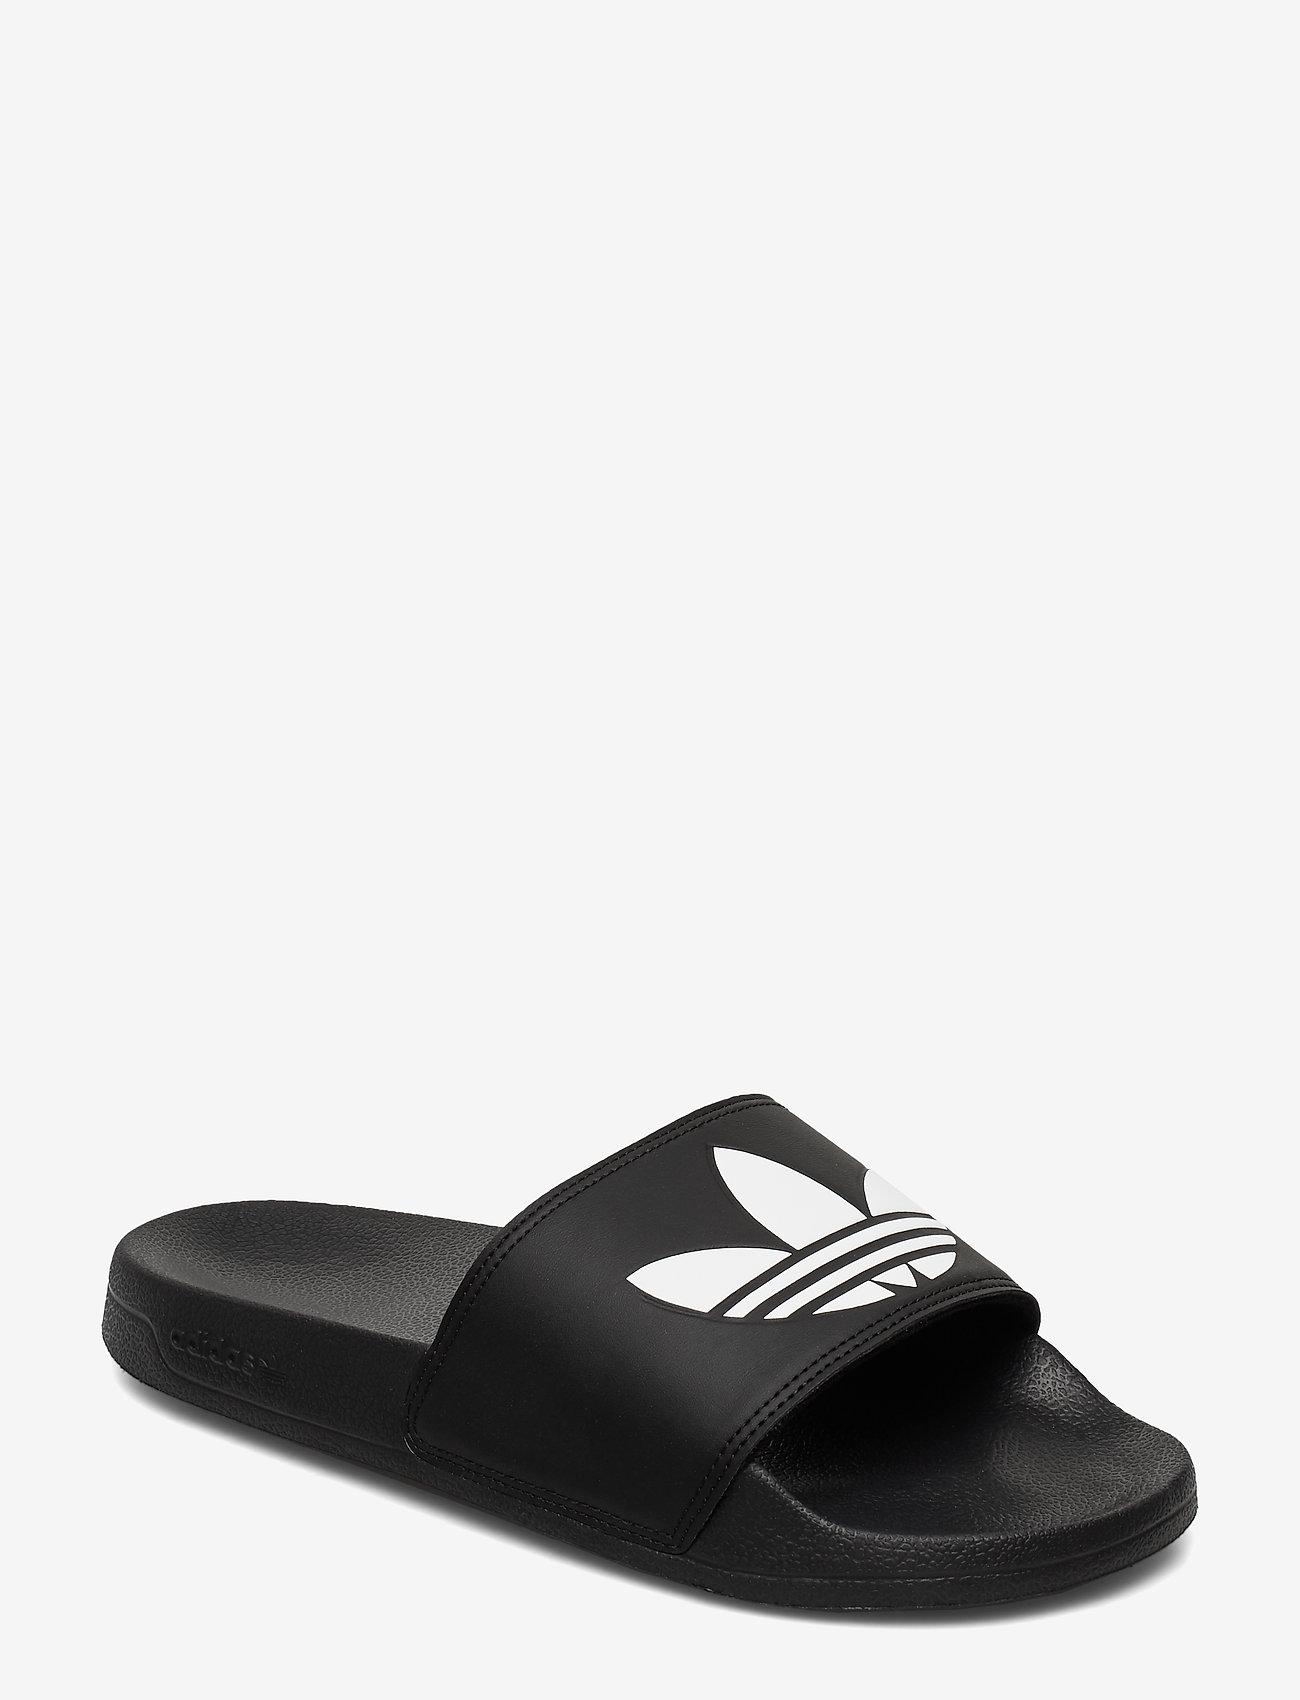 adidas Originals - Adilette Lite Slides - sneakers - cblack/ftwwht/cblack - 0